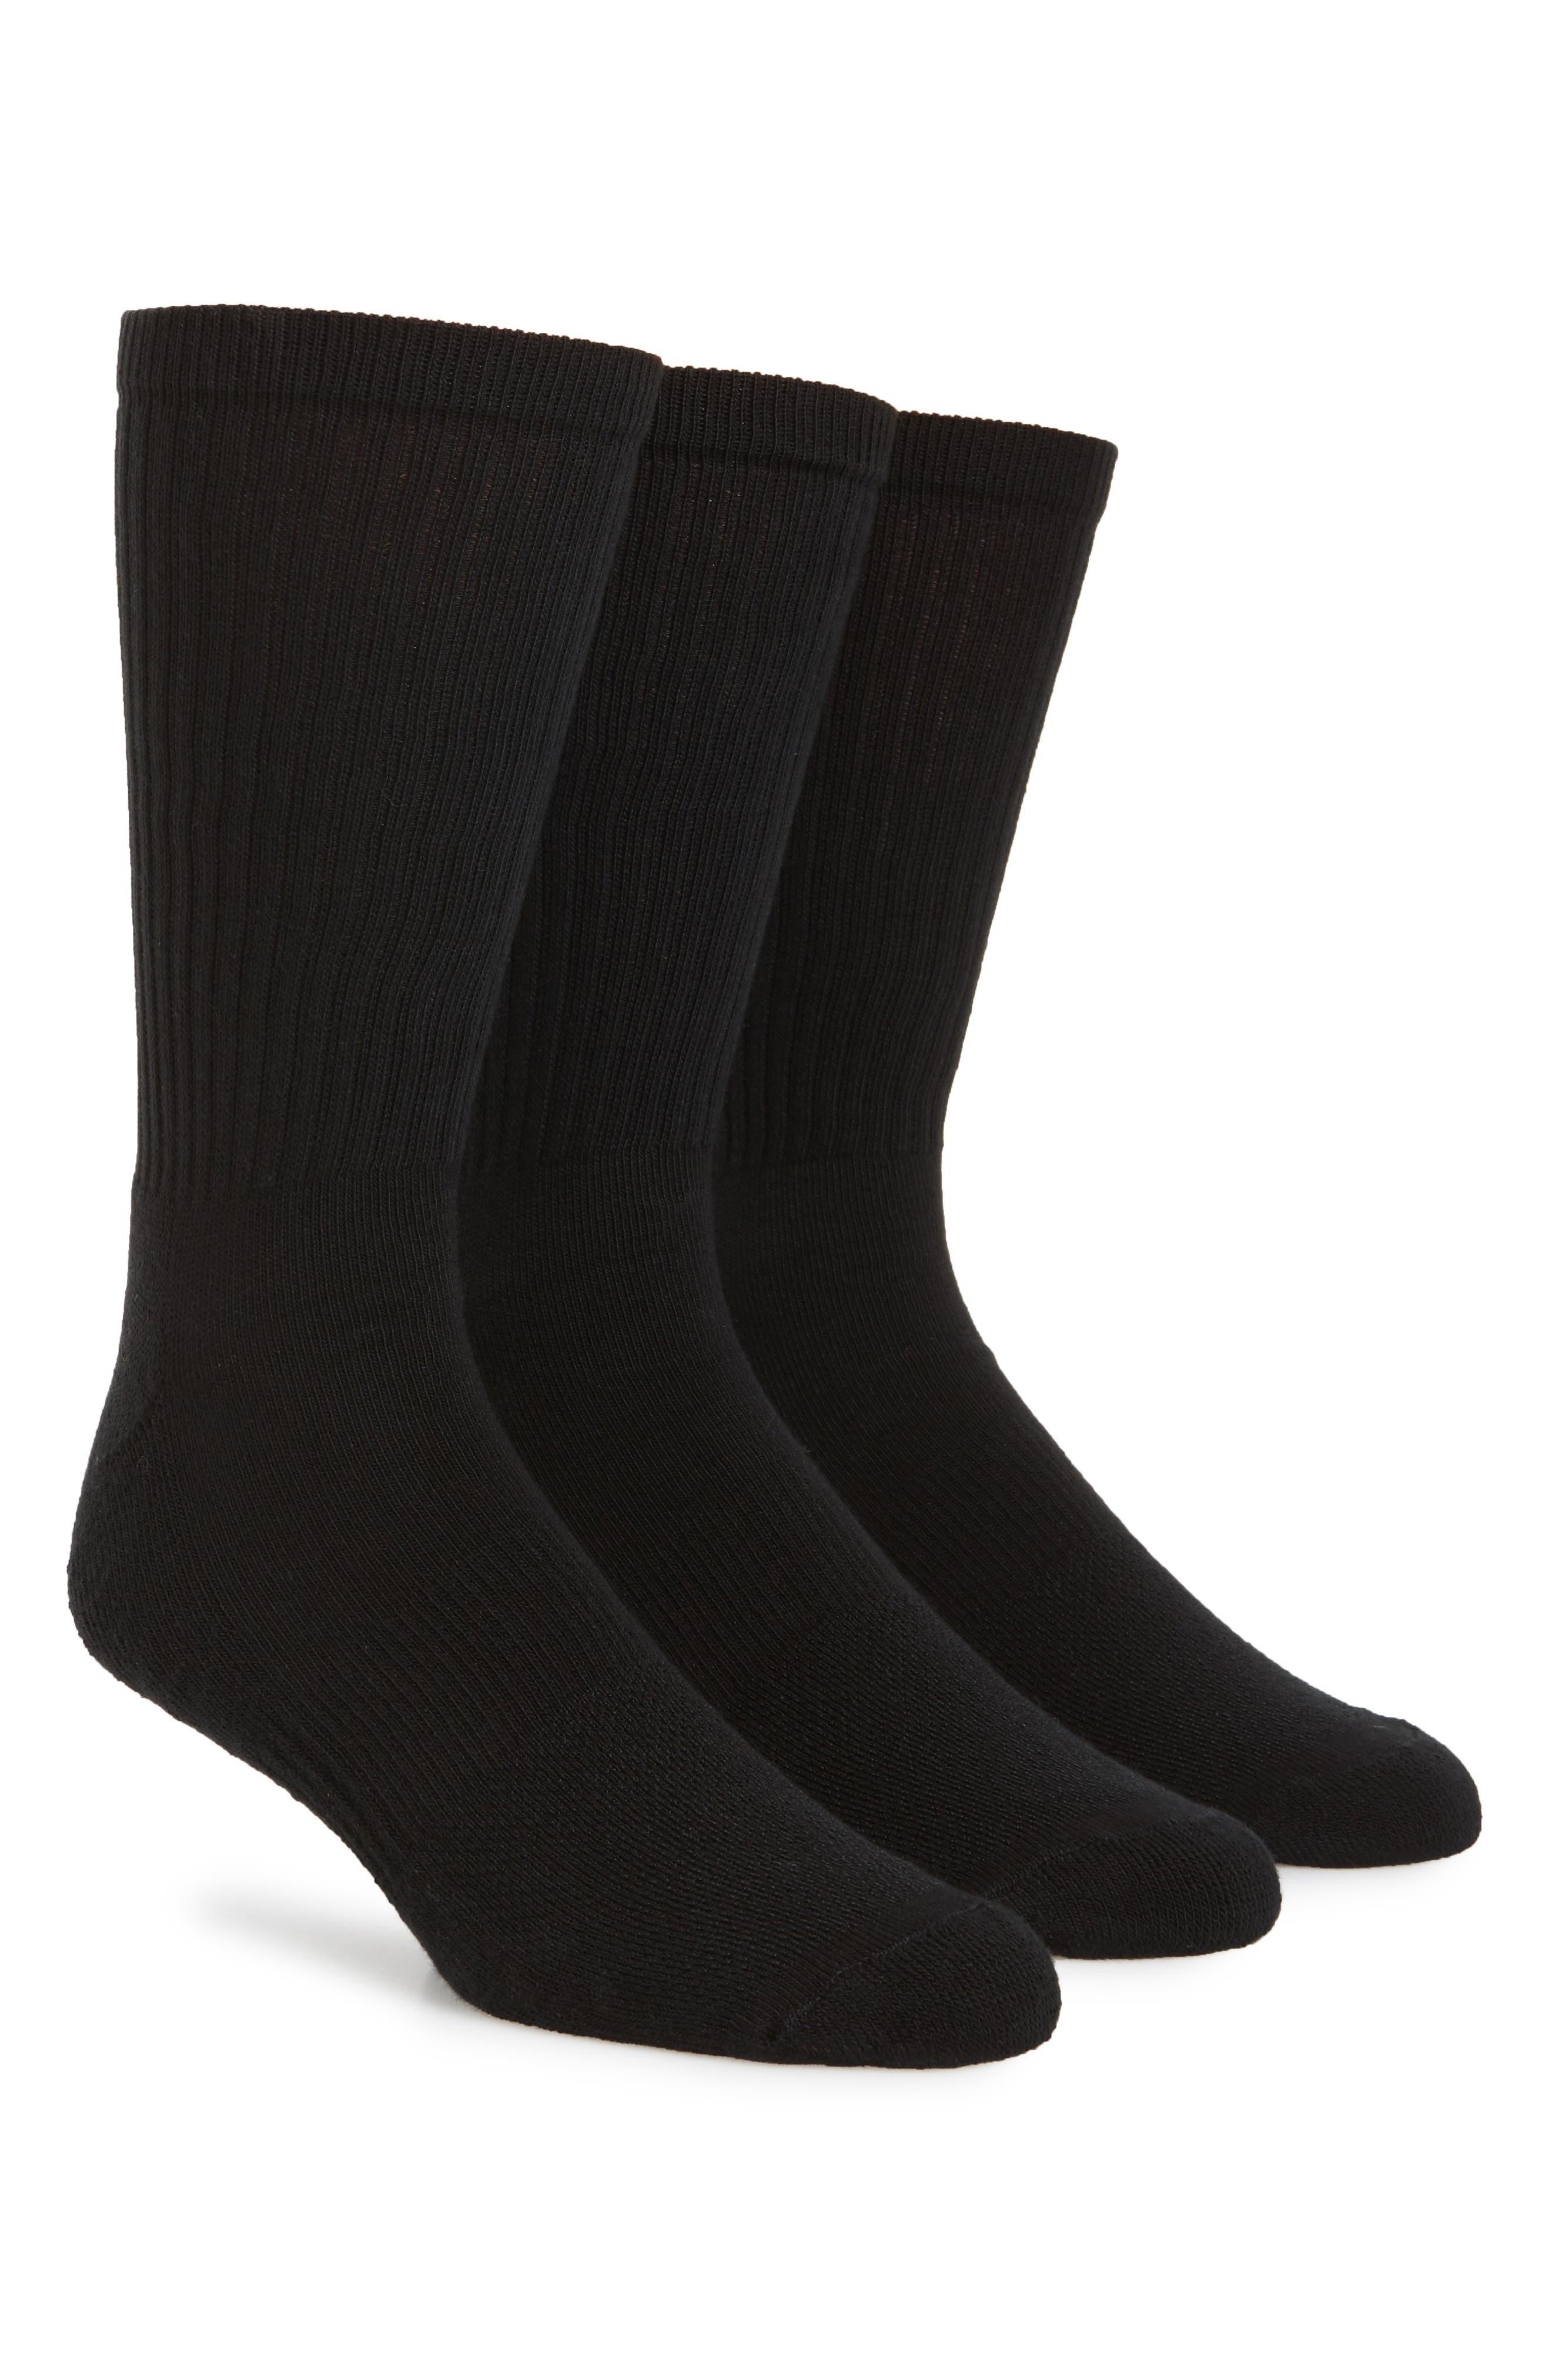 NORDSTROM MEN'S SHOP 3-Pack Crew Cut Athletic Socks, Main, color, BLACK